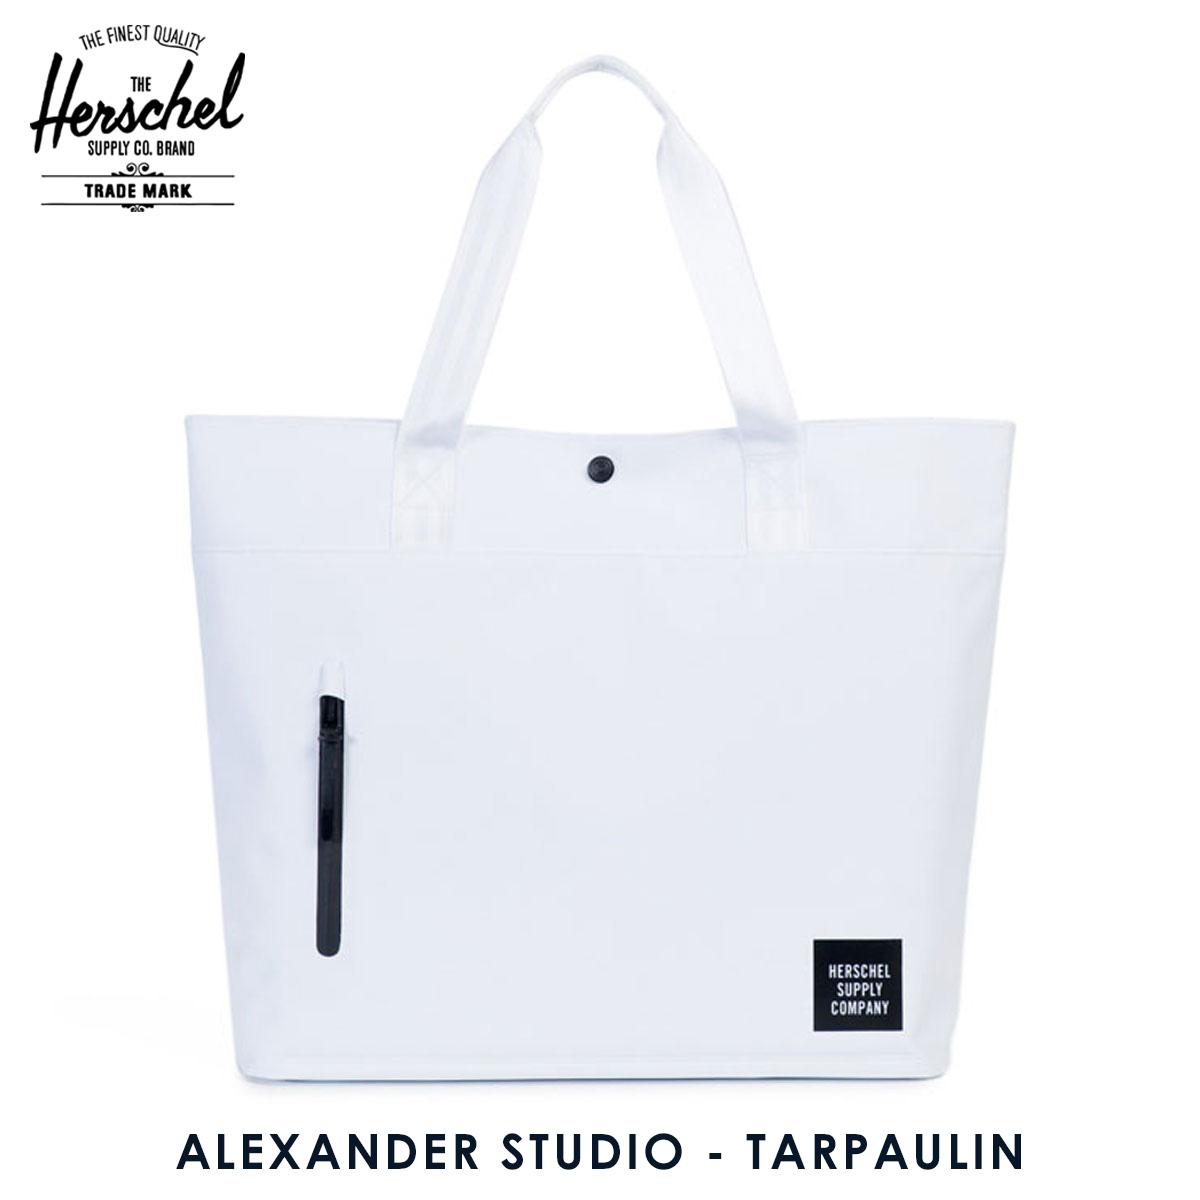 8a91042542 Herschel supply Herschel Supply regular sale shop bag ALEXANDER STUDIO -  TARPAULIN 10125-01004-OS WHITE